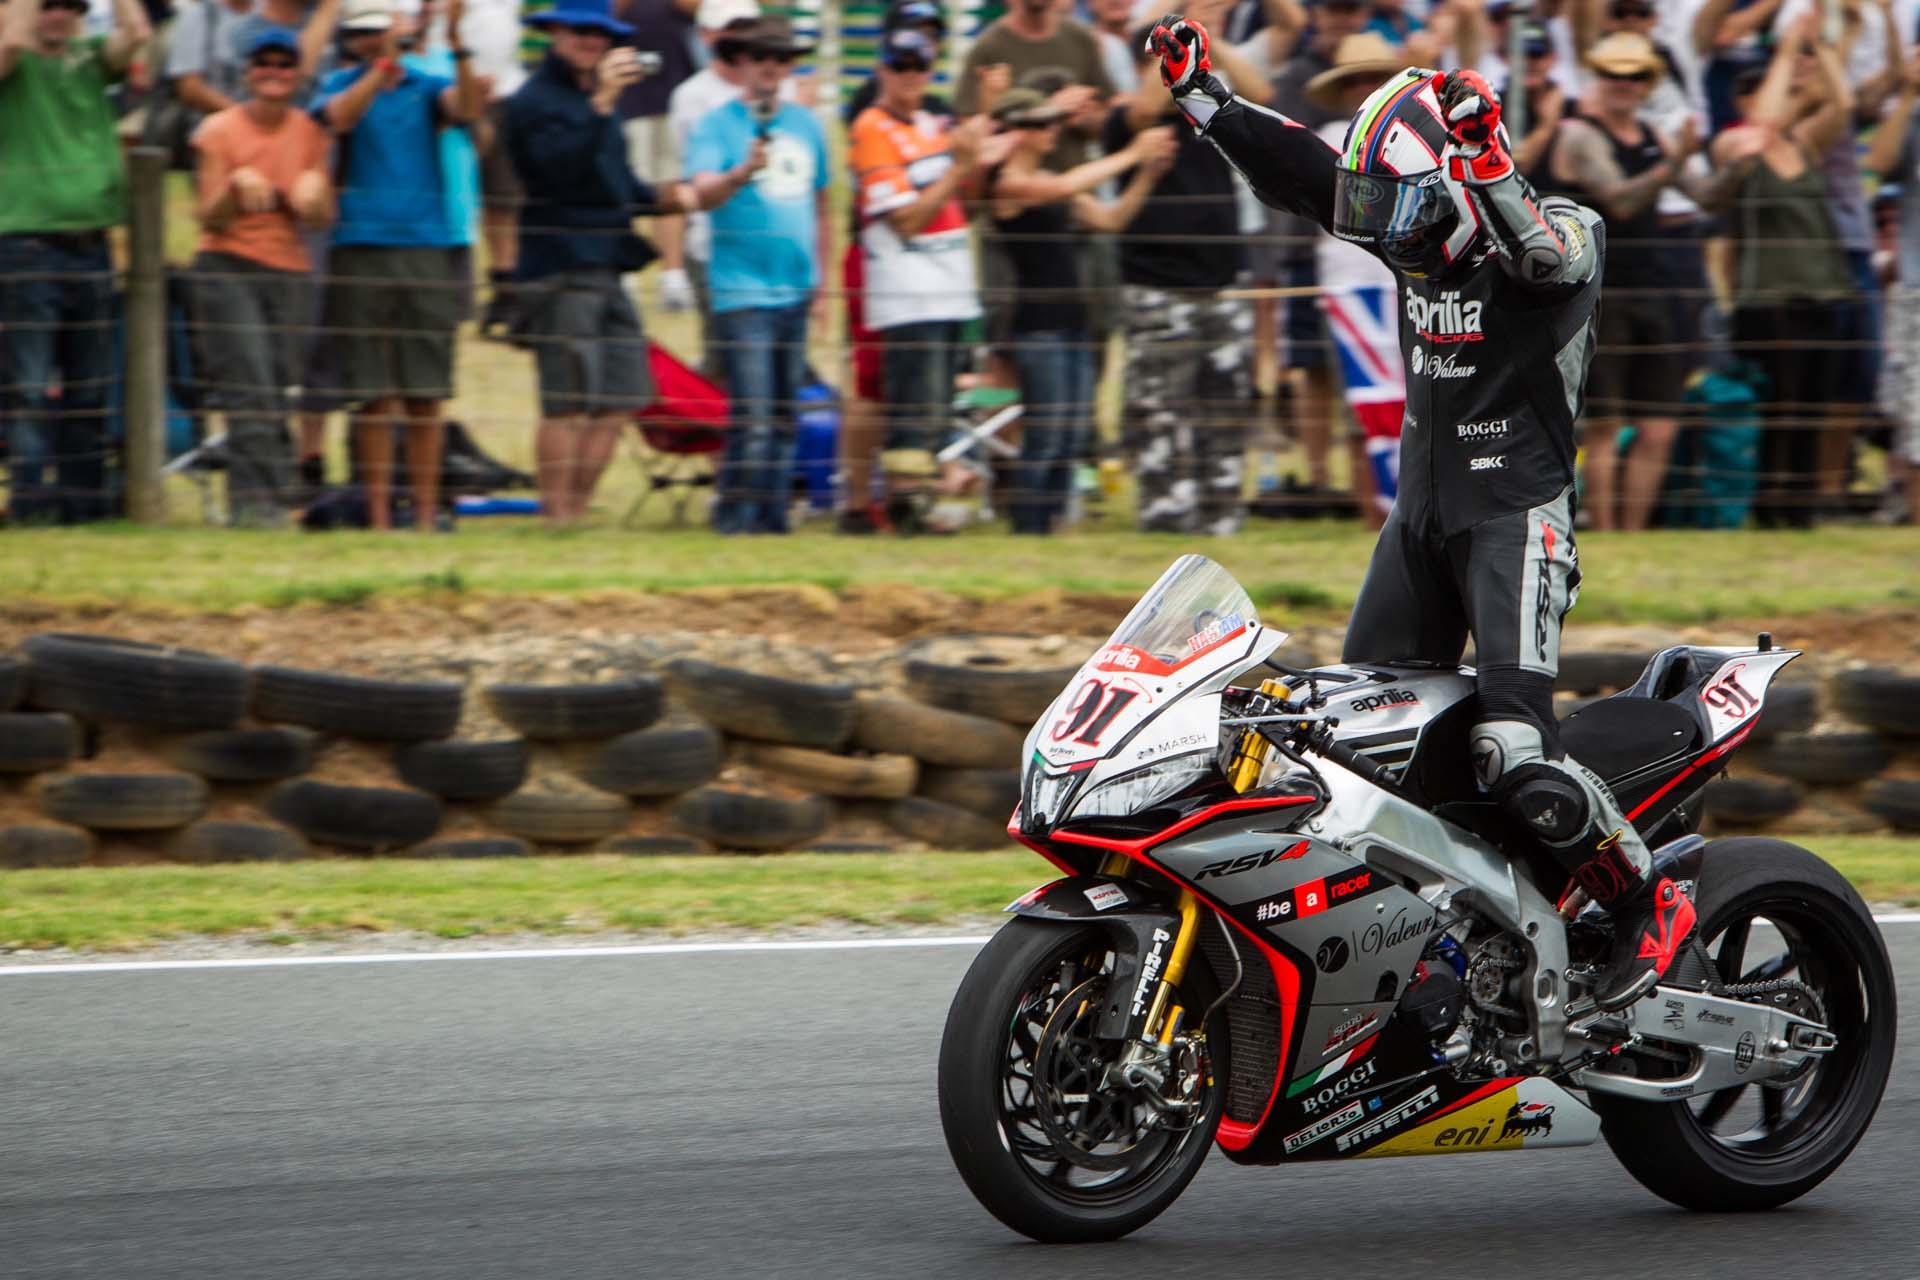 [WSBK] Phillip Island 2015-World-Superbike-Phillip-Island-Anant-Deboor-12